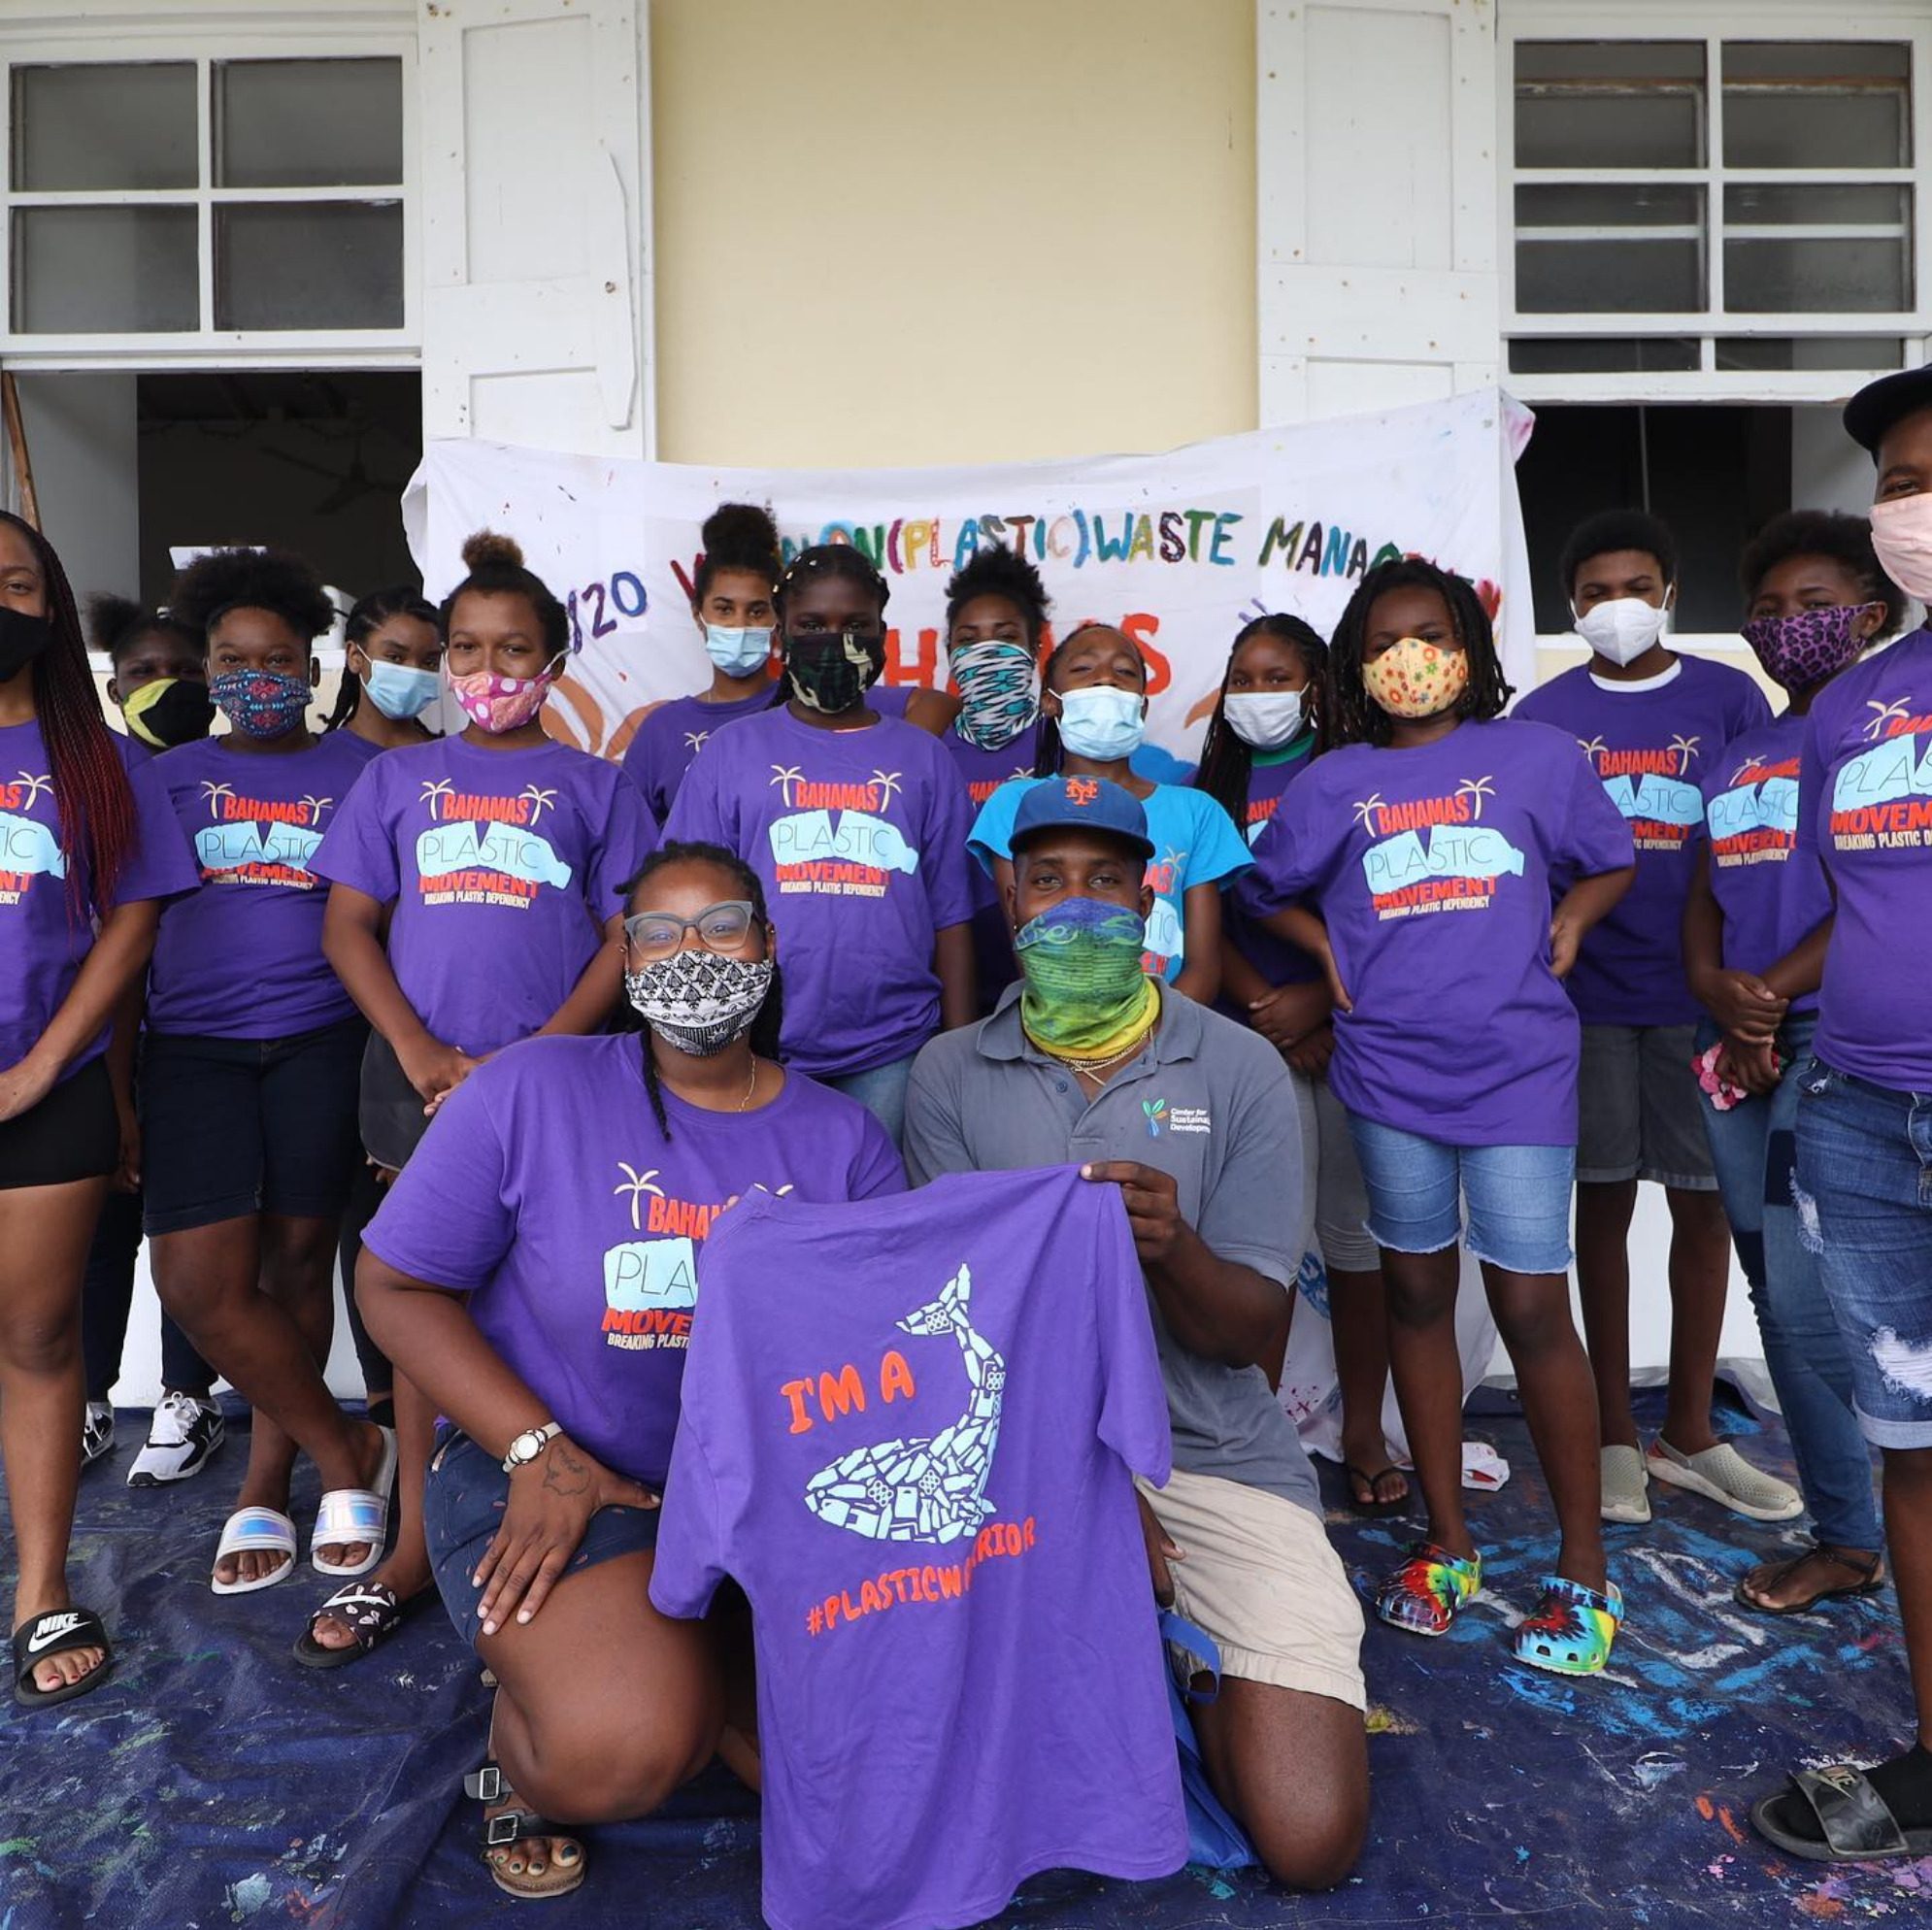 Bahamas Plastic Movement